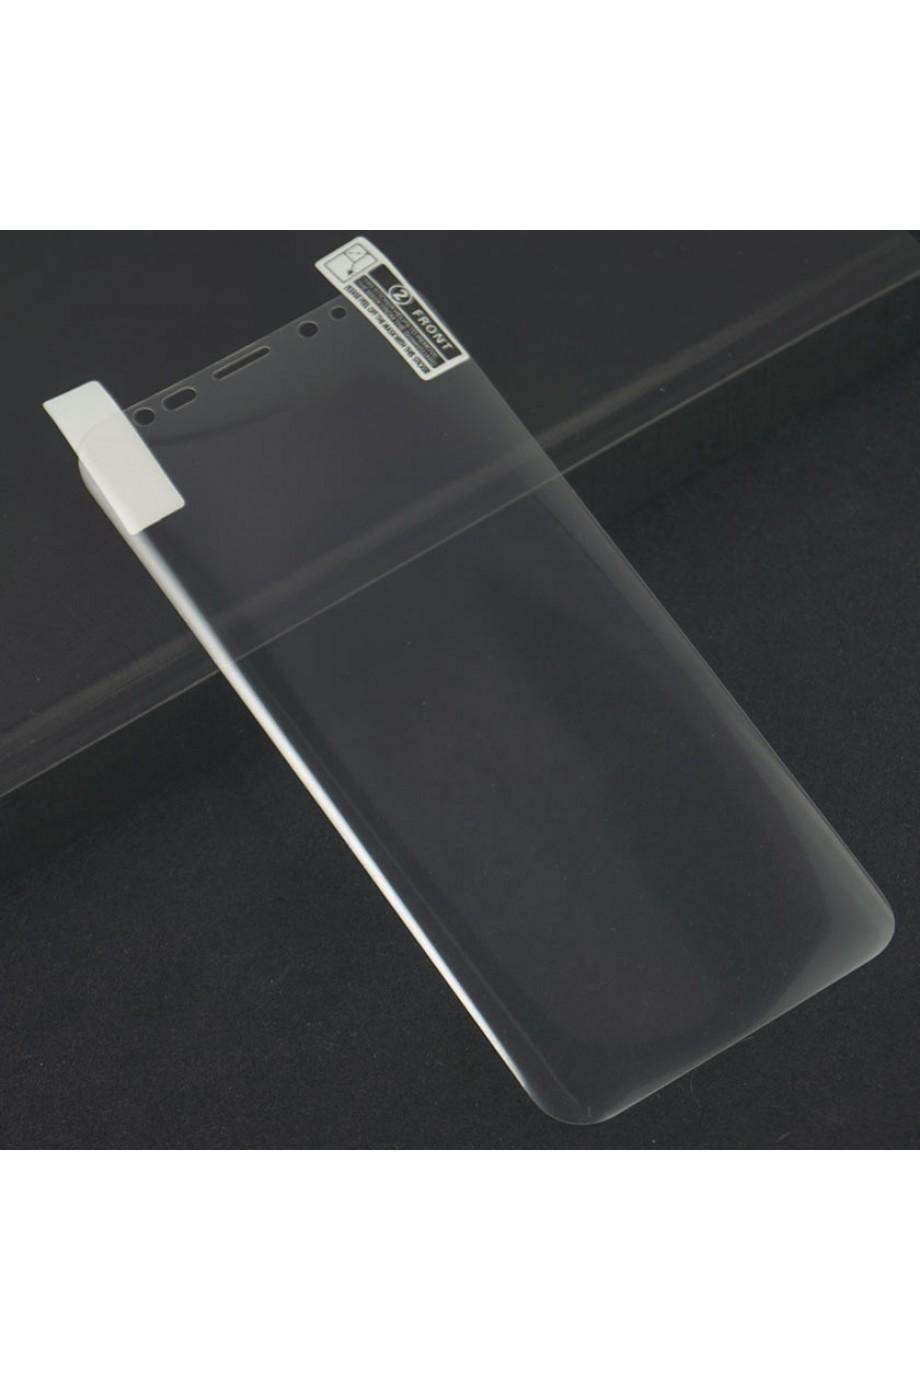 Защитная пленка 3D Mikomo для Samsung Galaxy S9 Plus